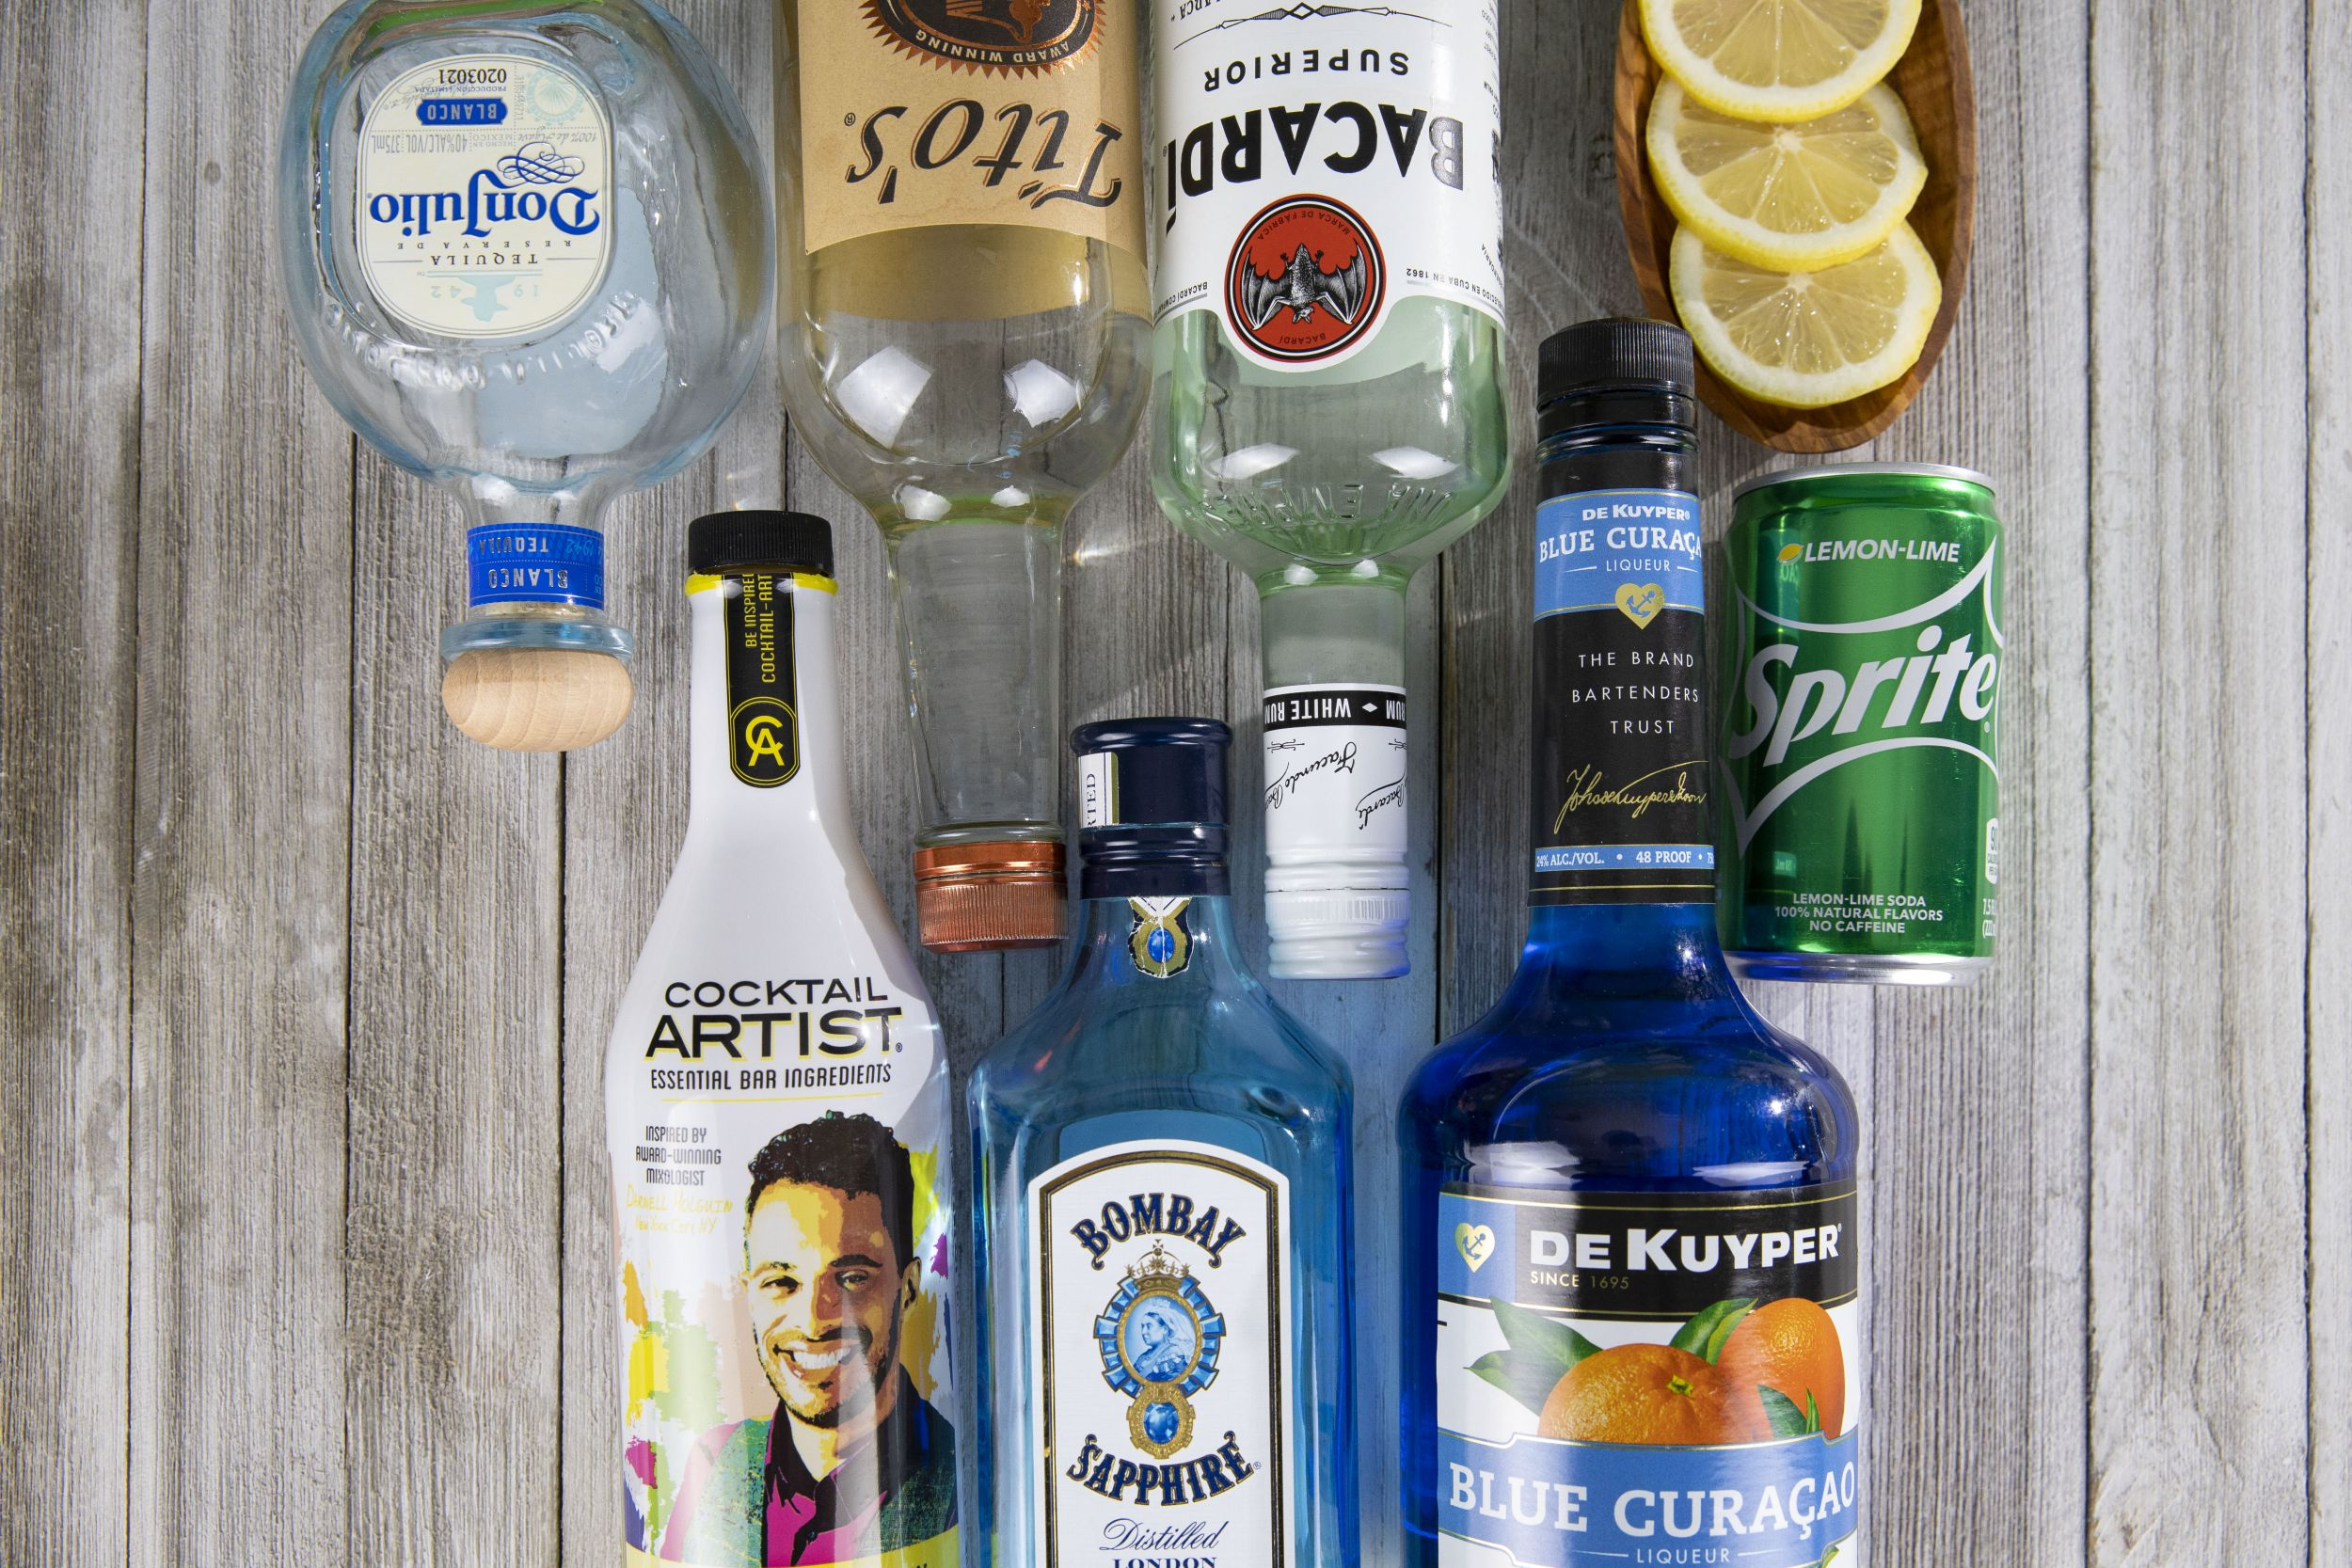 Adios Motherfucker Amf Cocktail Recipe Thirsty Bartenders